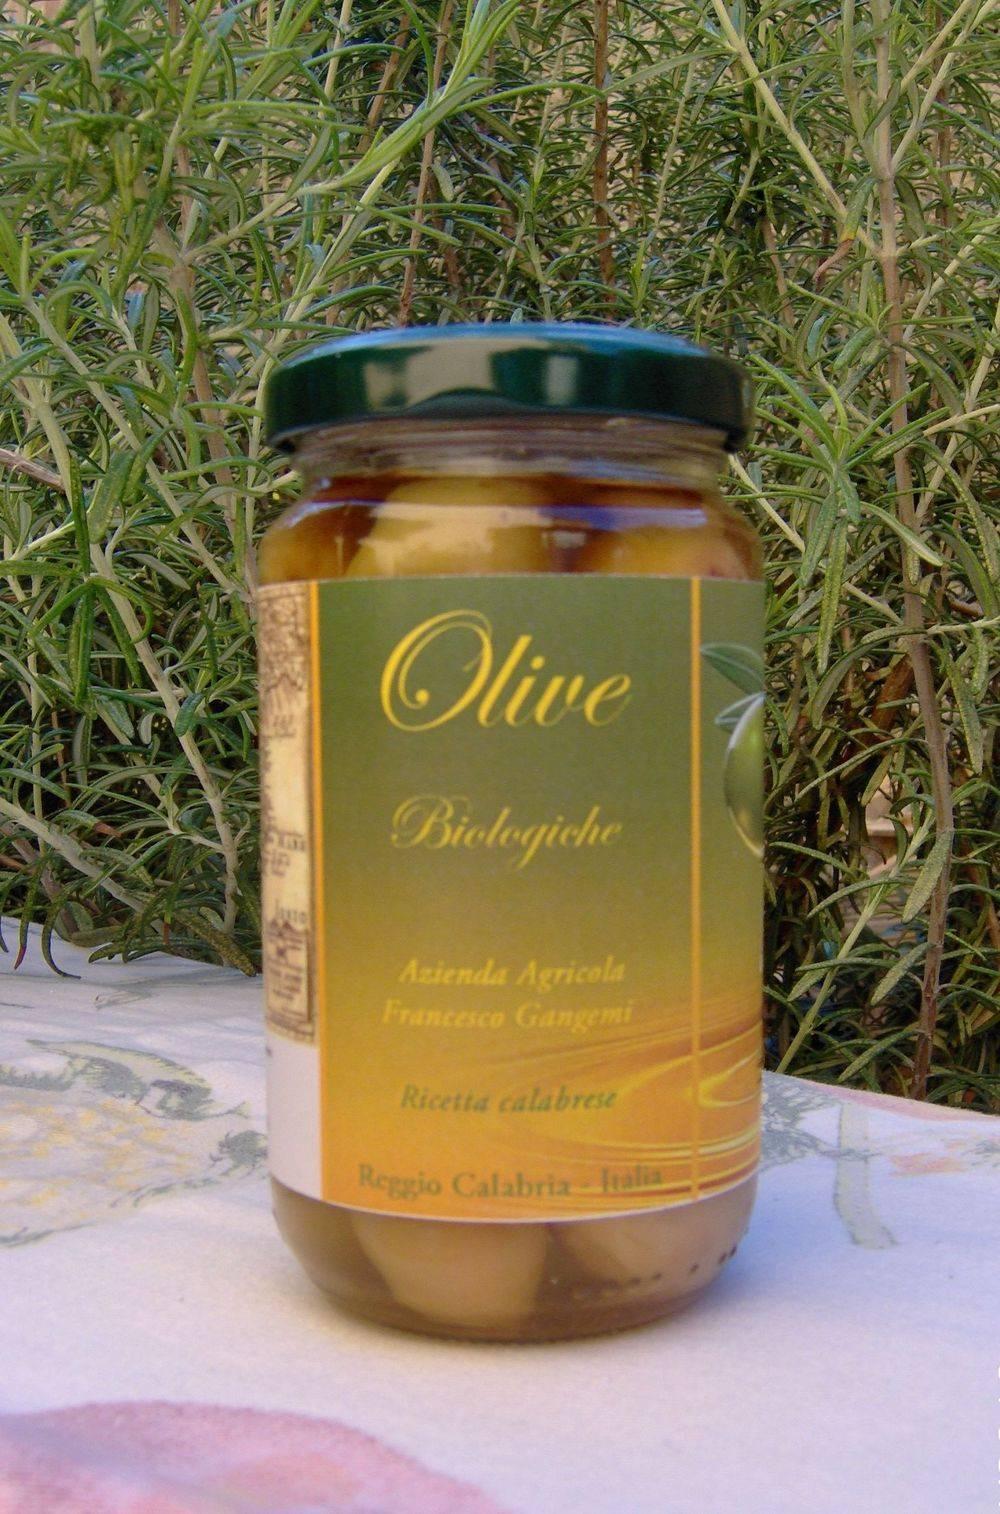 olive biologiche in ricetta calabrese-Azienda Agricola Francesco Gangemi